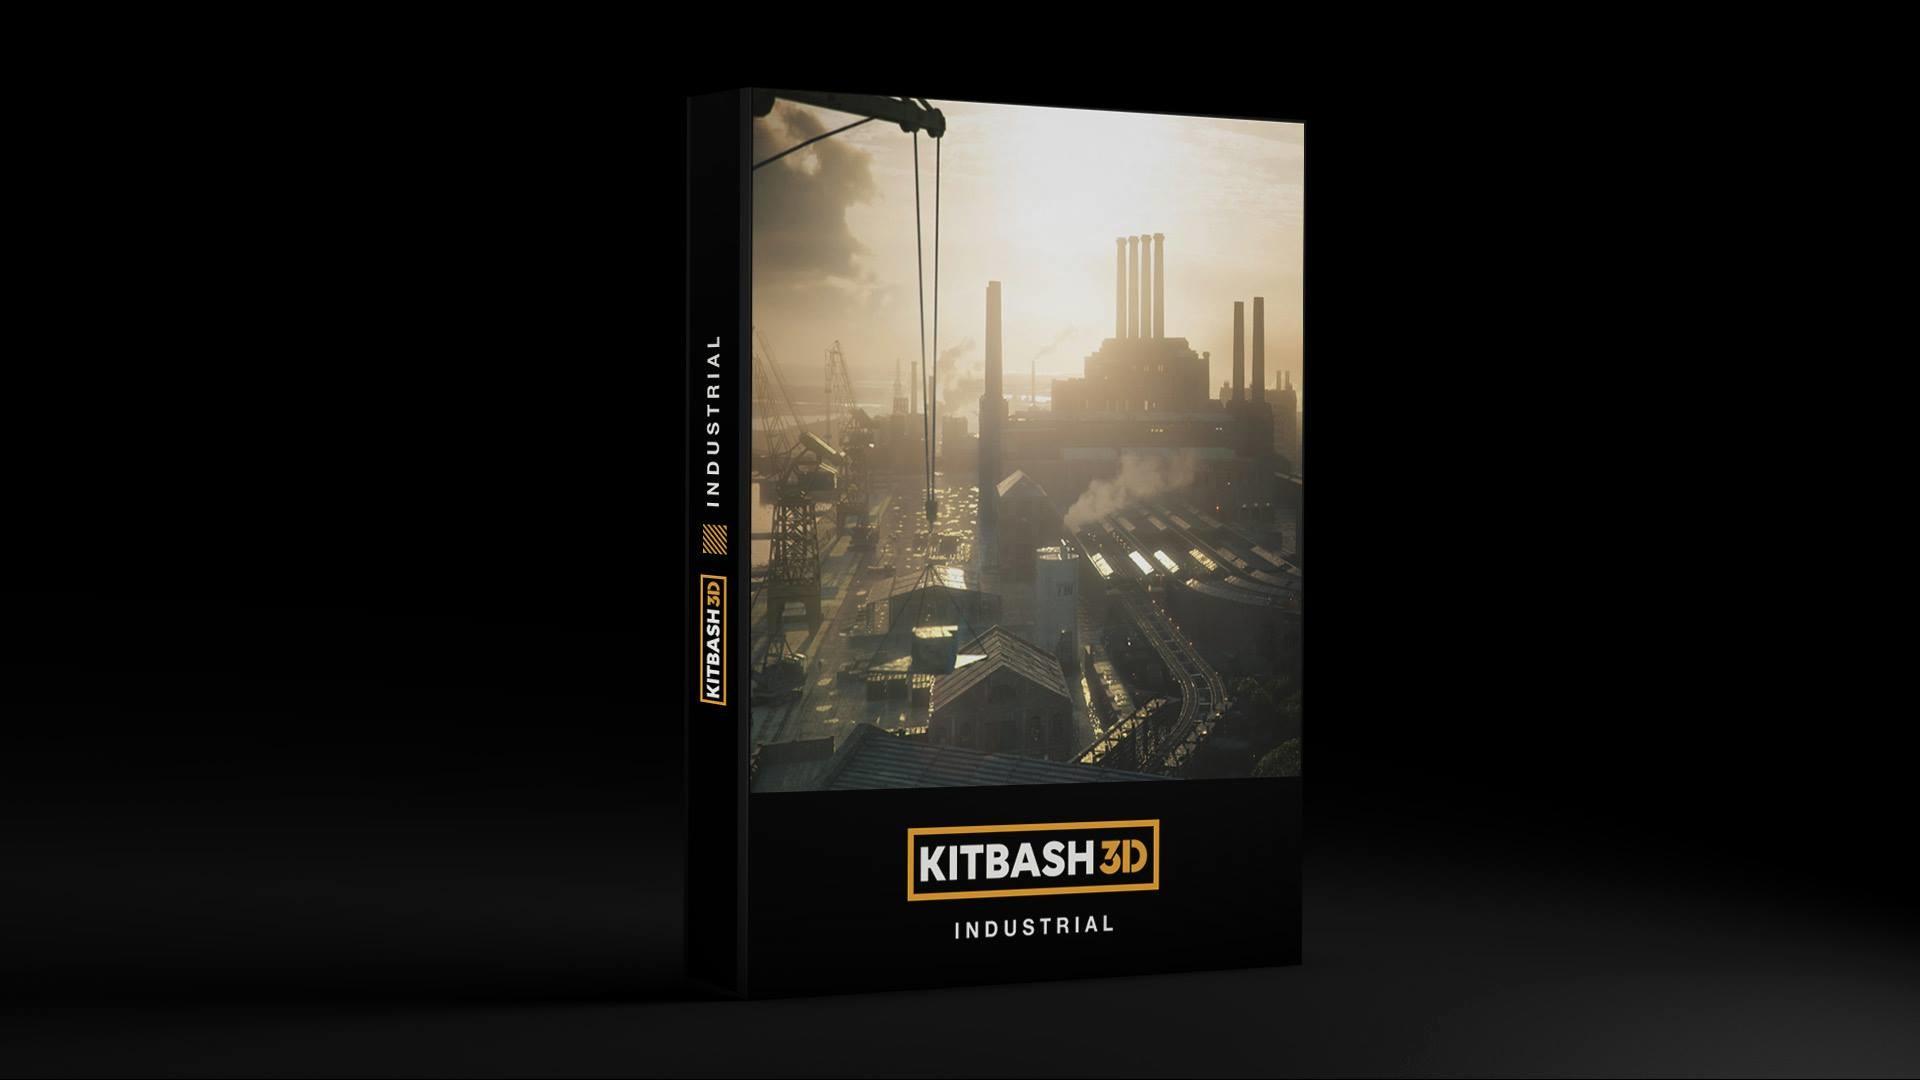 ArtStation - Kitbash3D - Industrial, Mihailo Radosevic